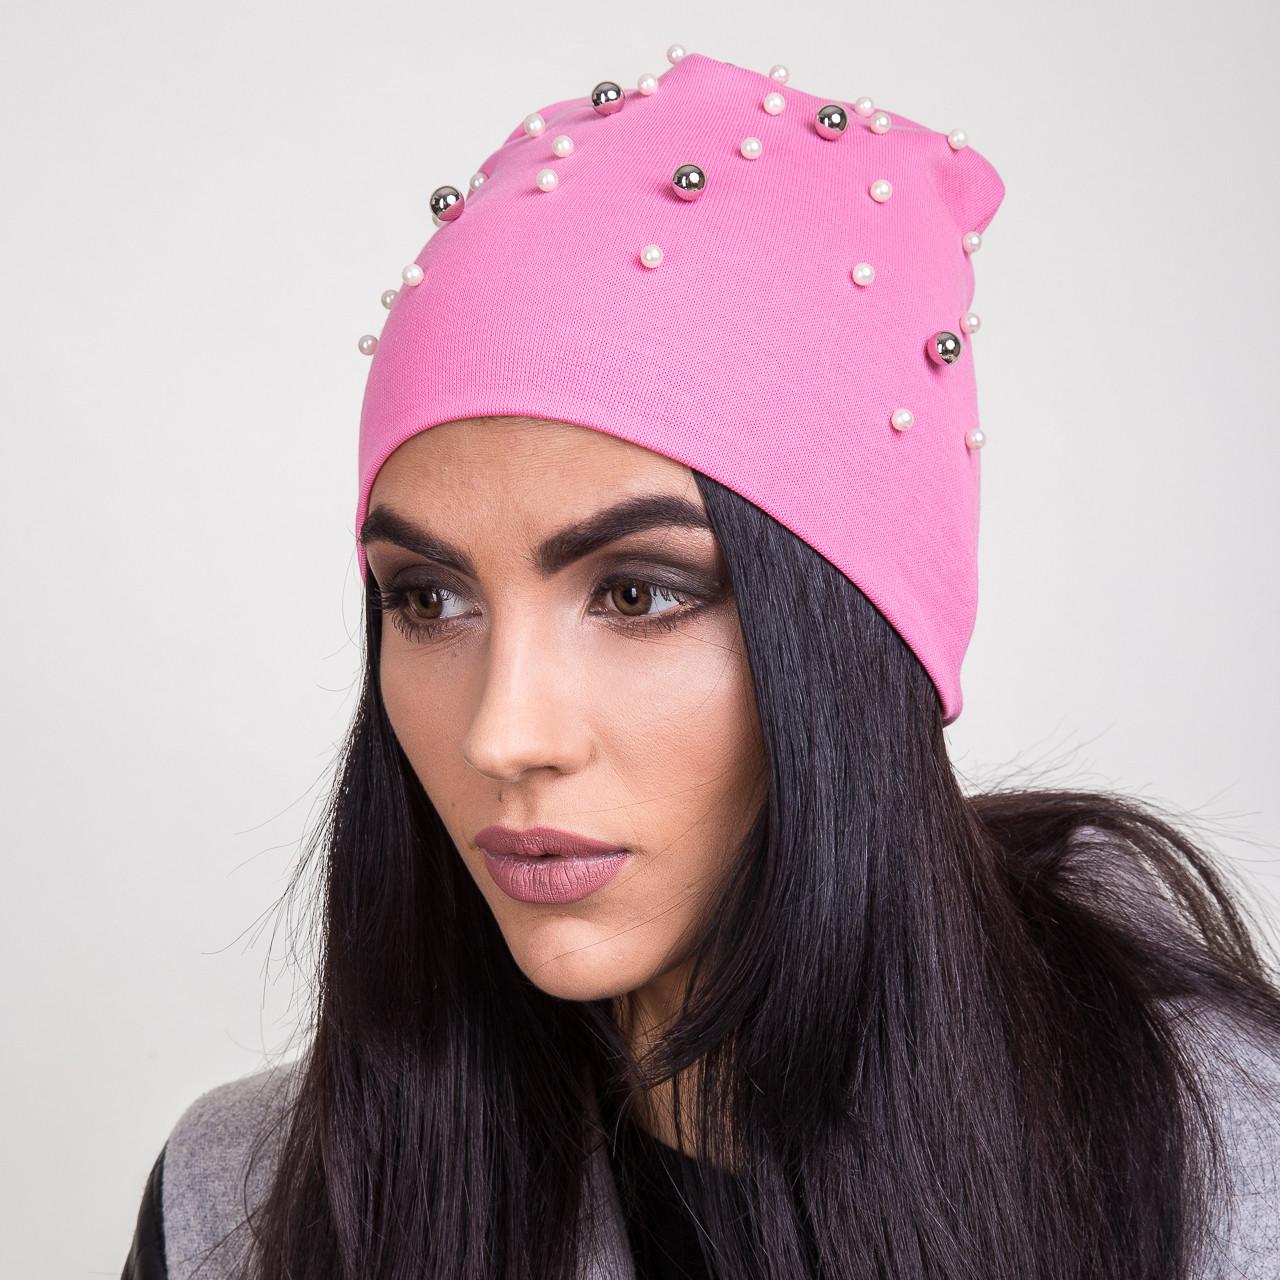 Женская шапка с бусинками на весну 2018 оптом - Артикул 2056, фото 2